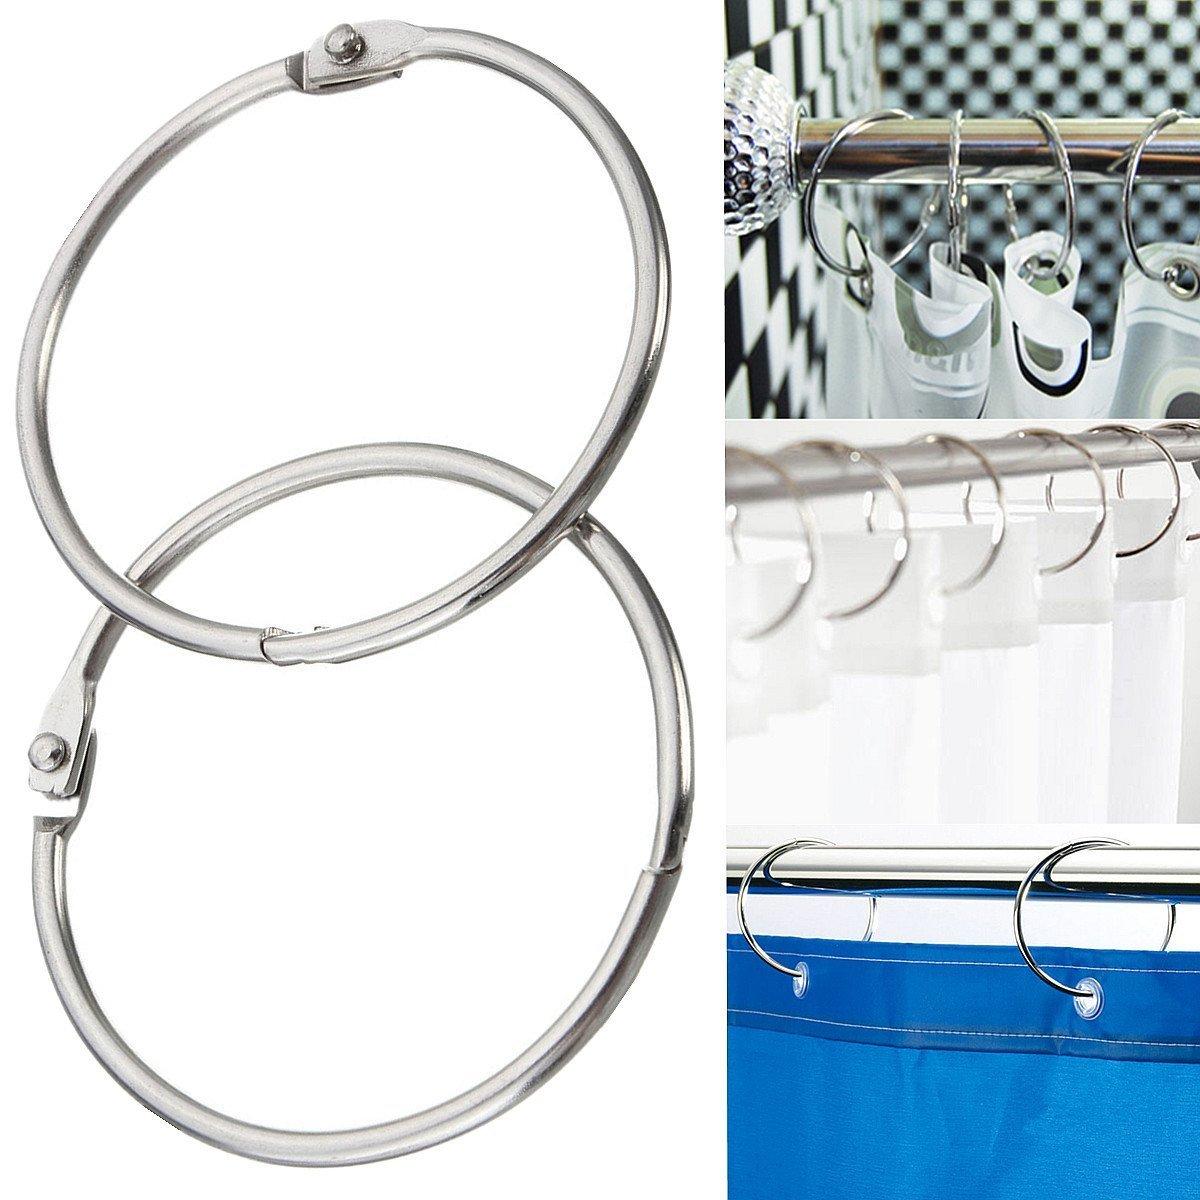 Geelyda 6PCS Metal Round Shower Curtain Hooks Book Rings Scrapbooking Nickel Plated Binding Rings Keychain Key Rings 3 inches